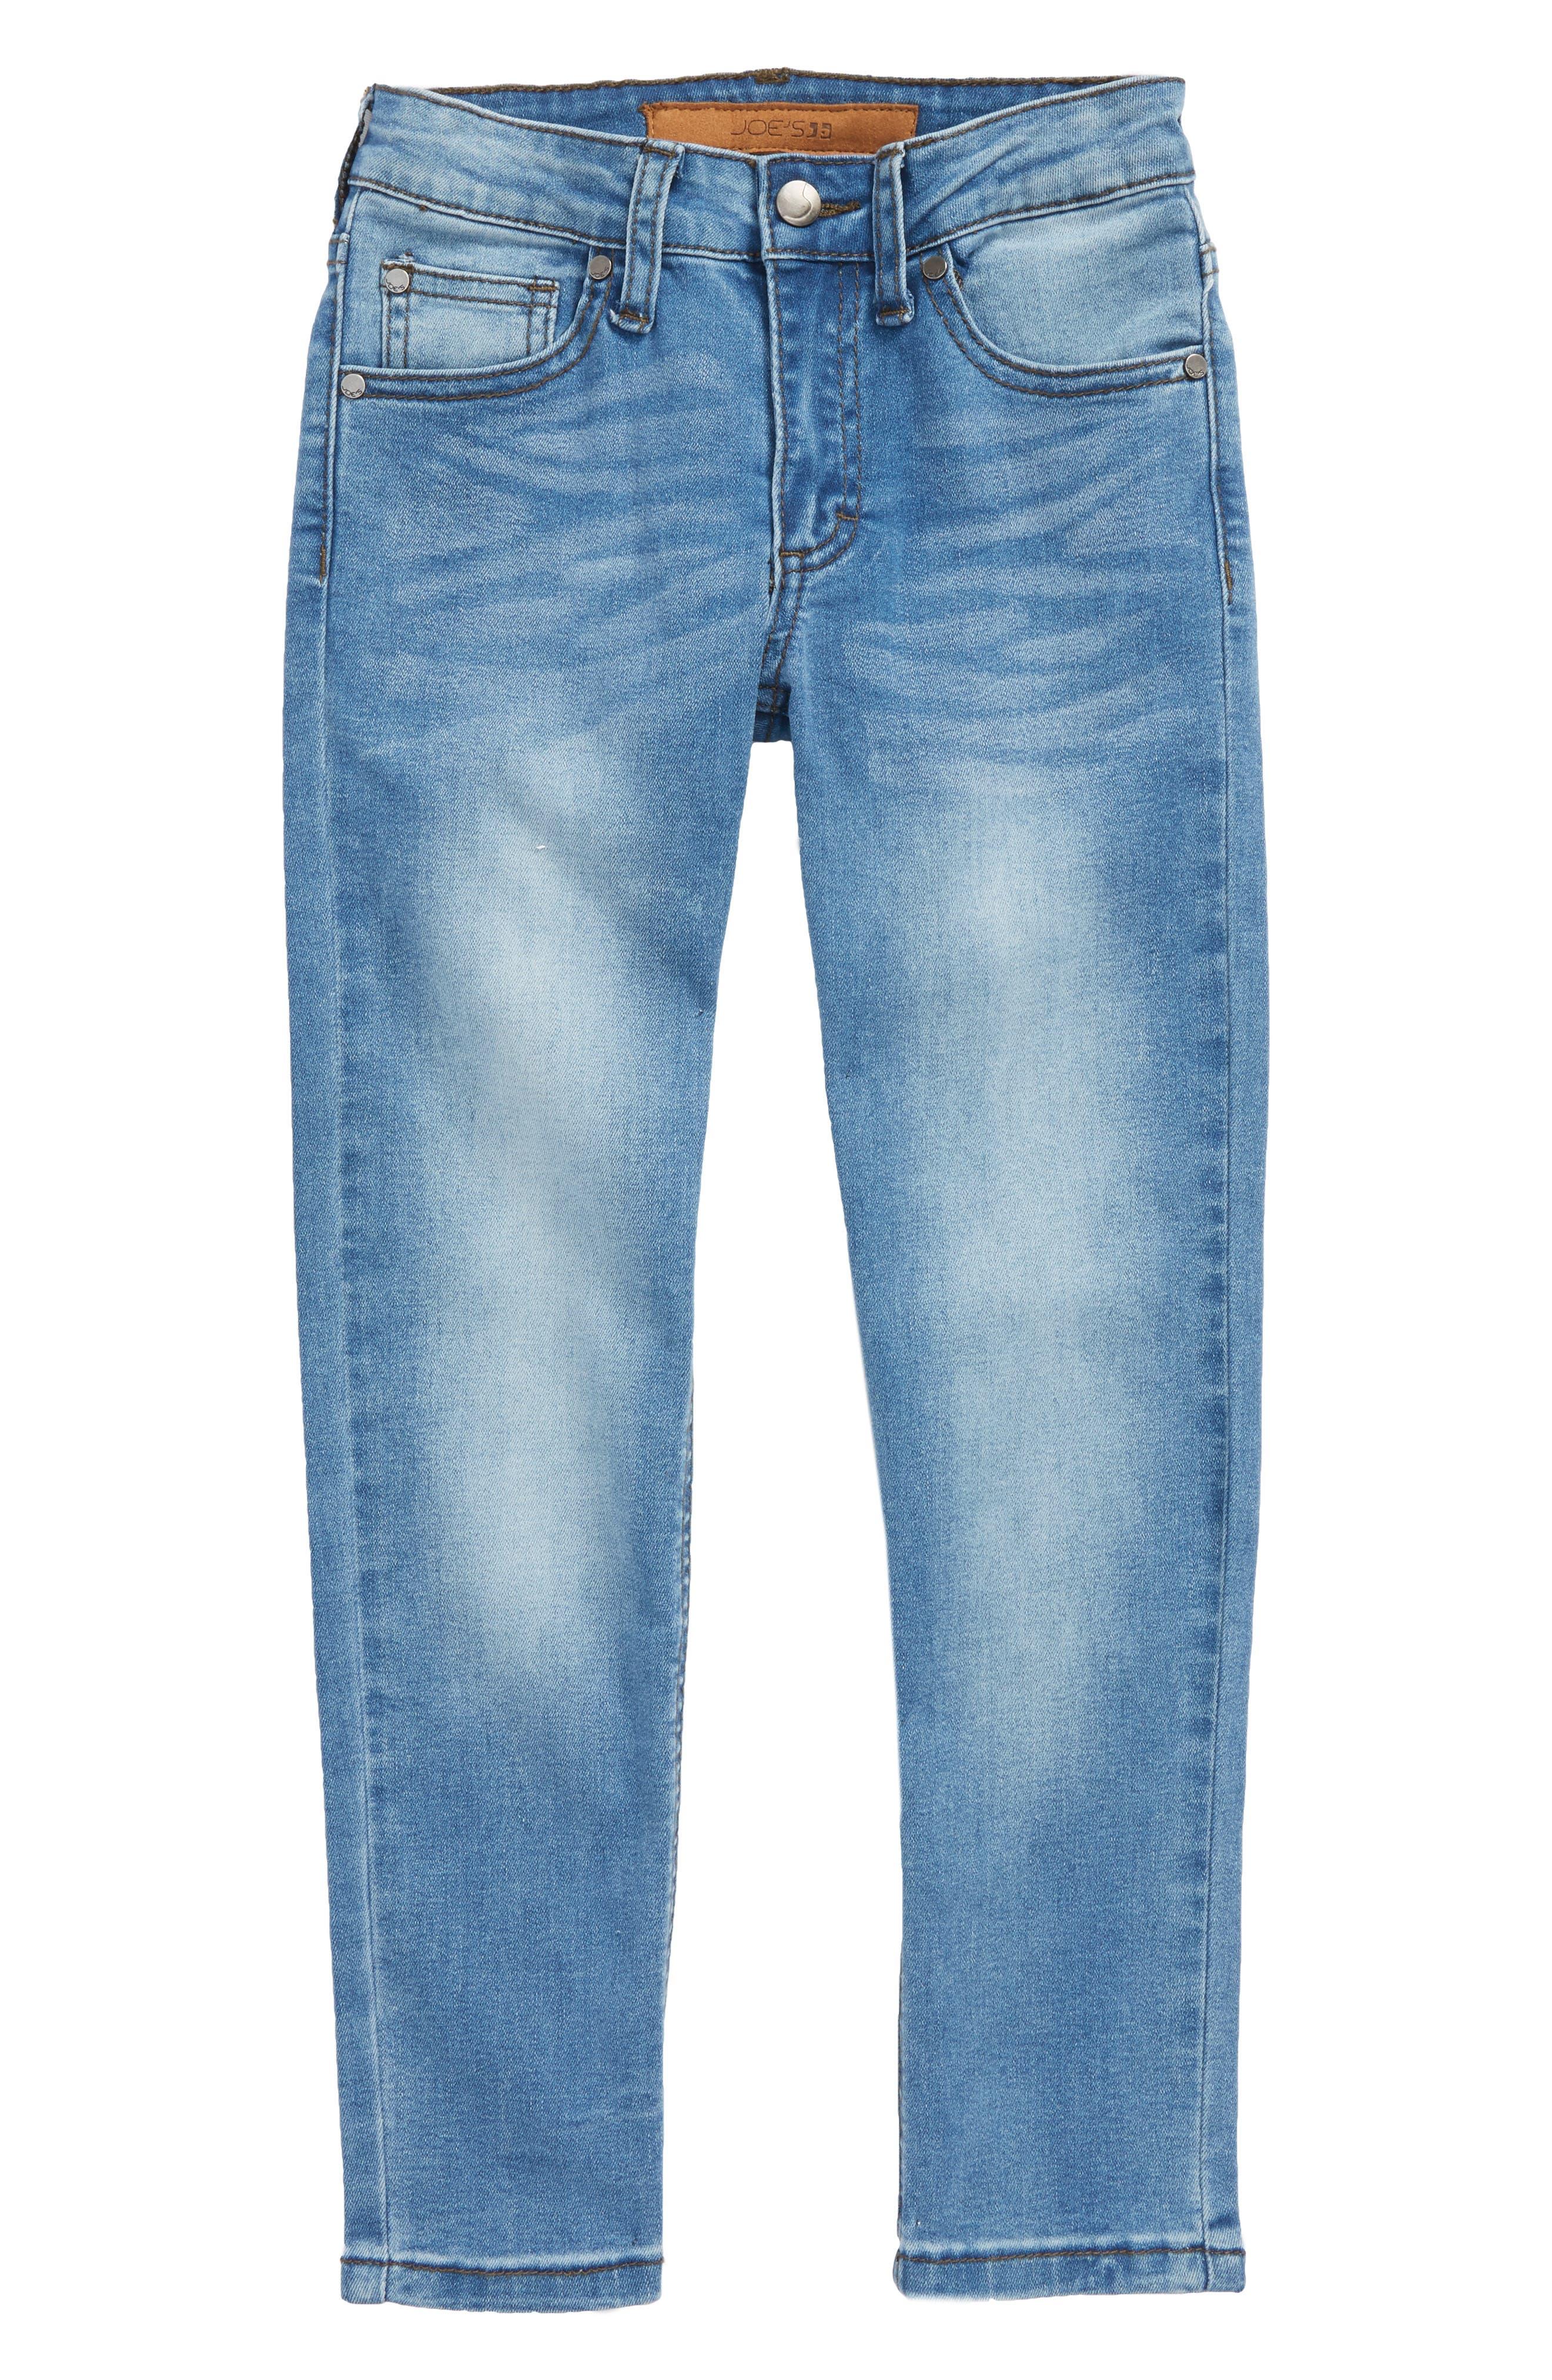 Rad Slim Fit Stretch Jeans,                         Main,                         color, 463